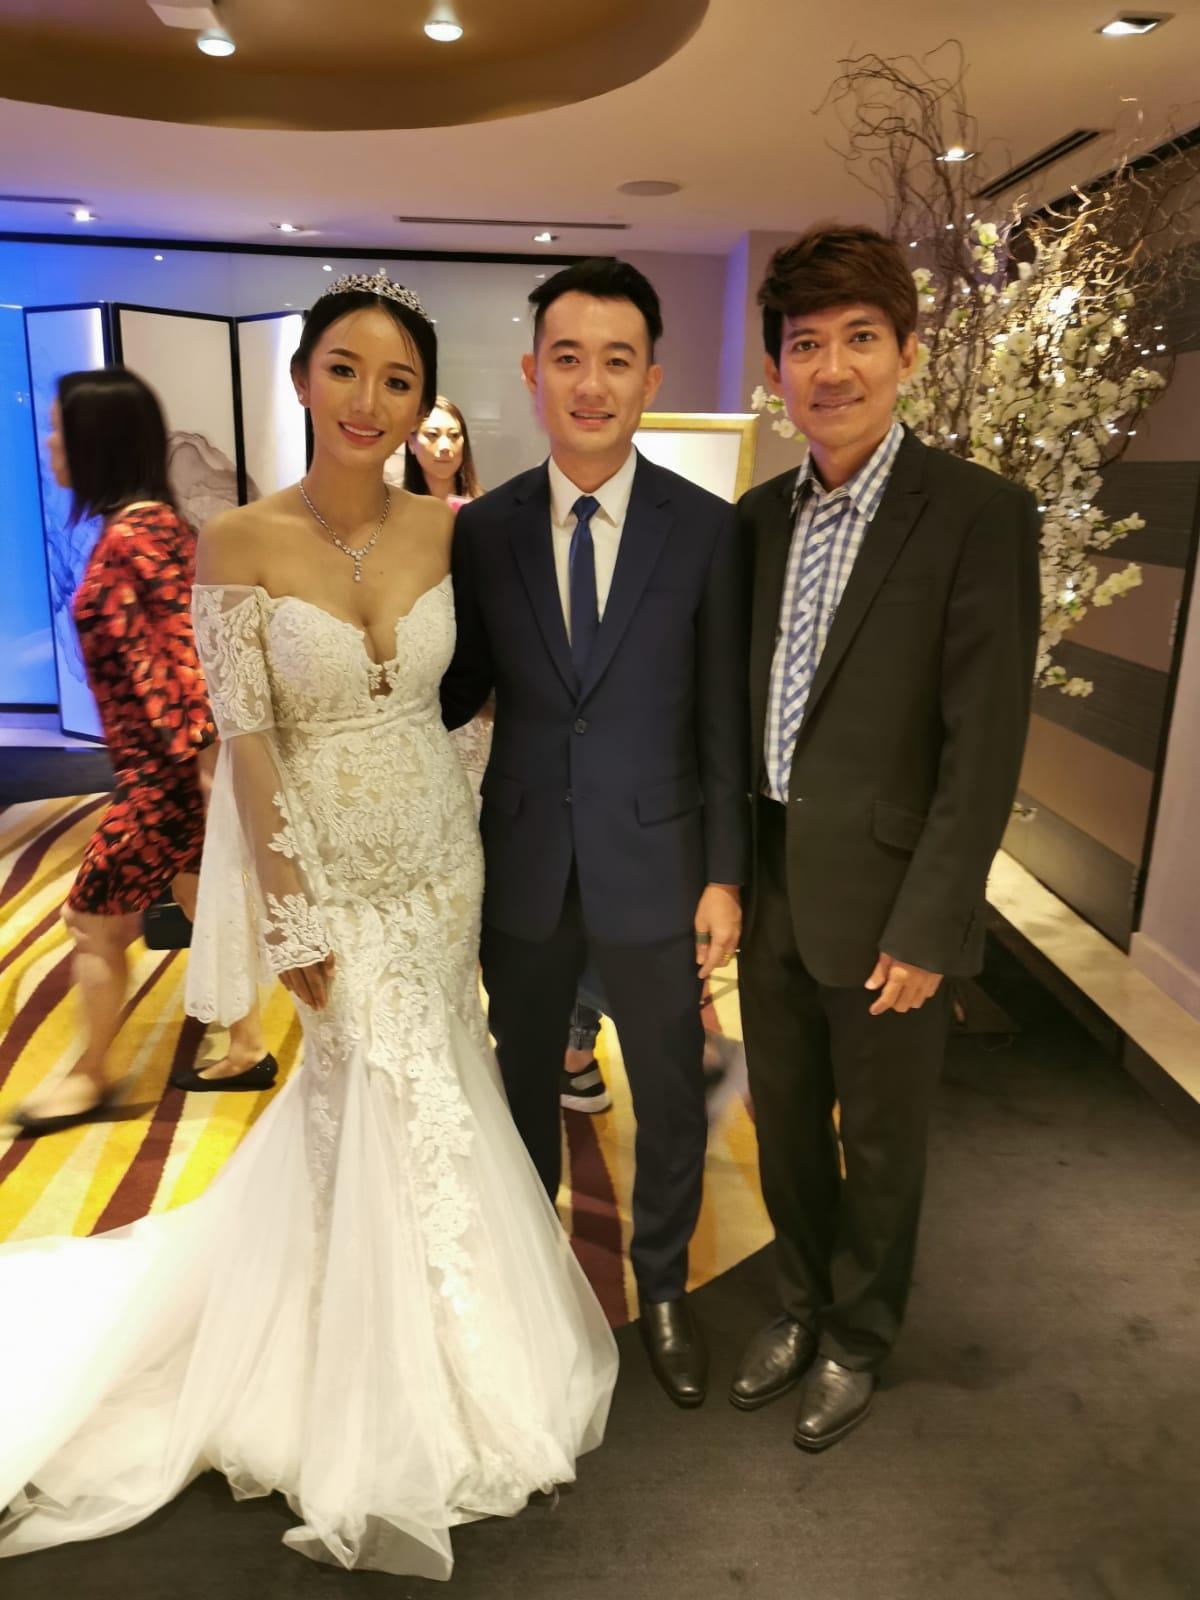 Thai Wedding in Singapore Live Band Music Singer